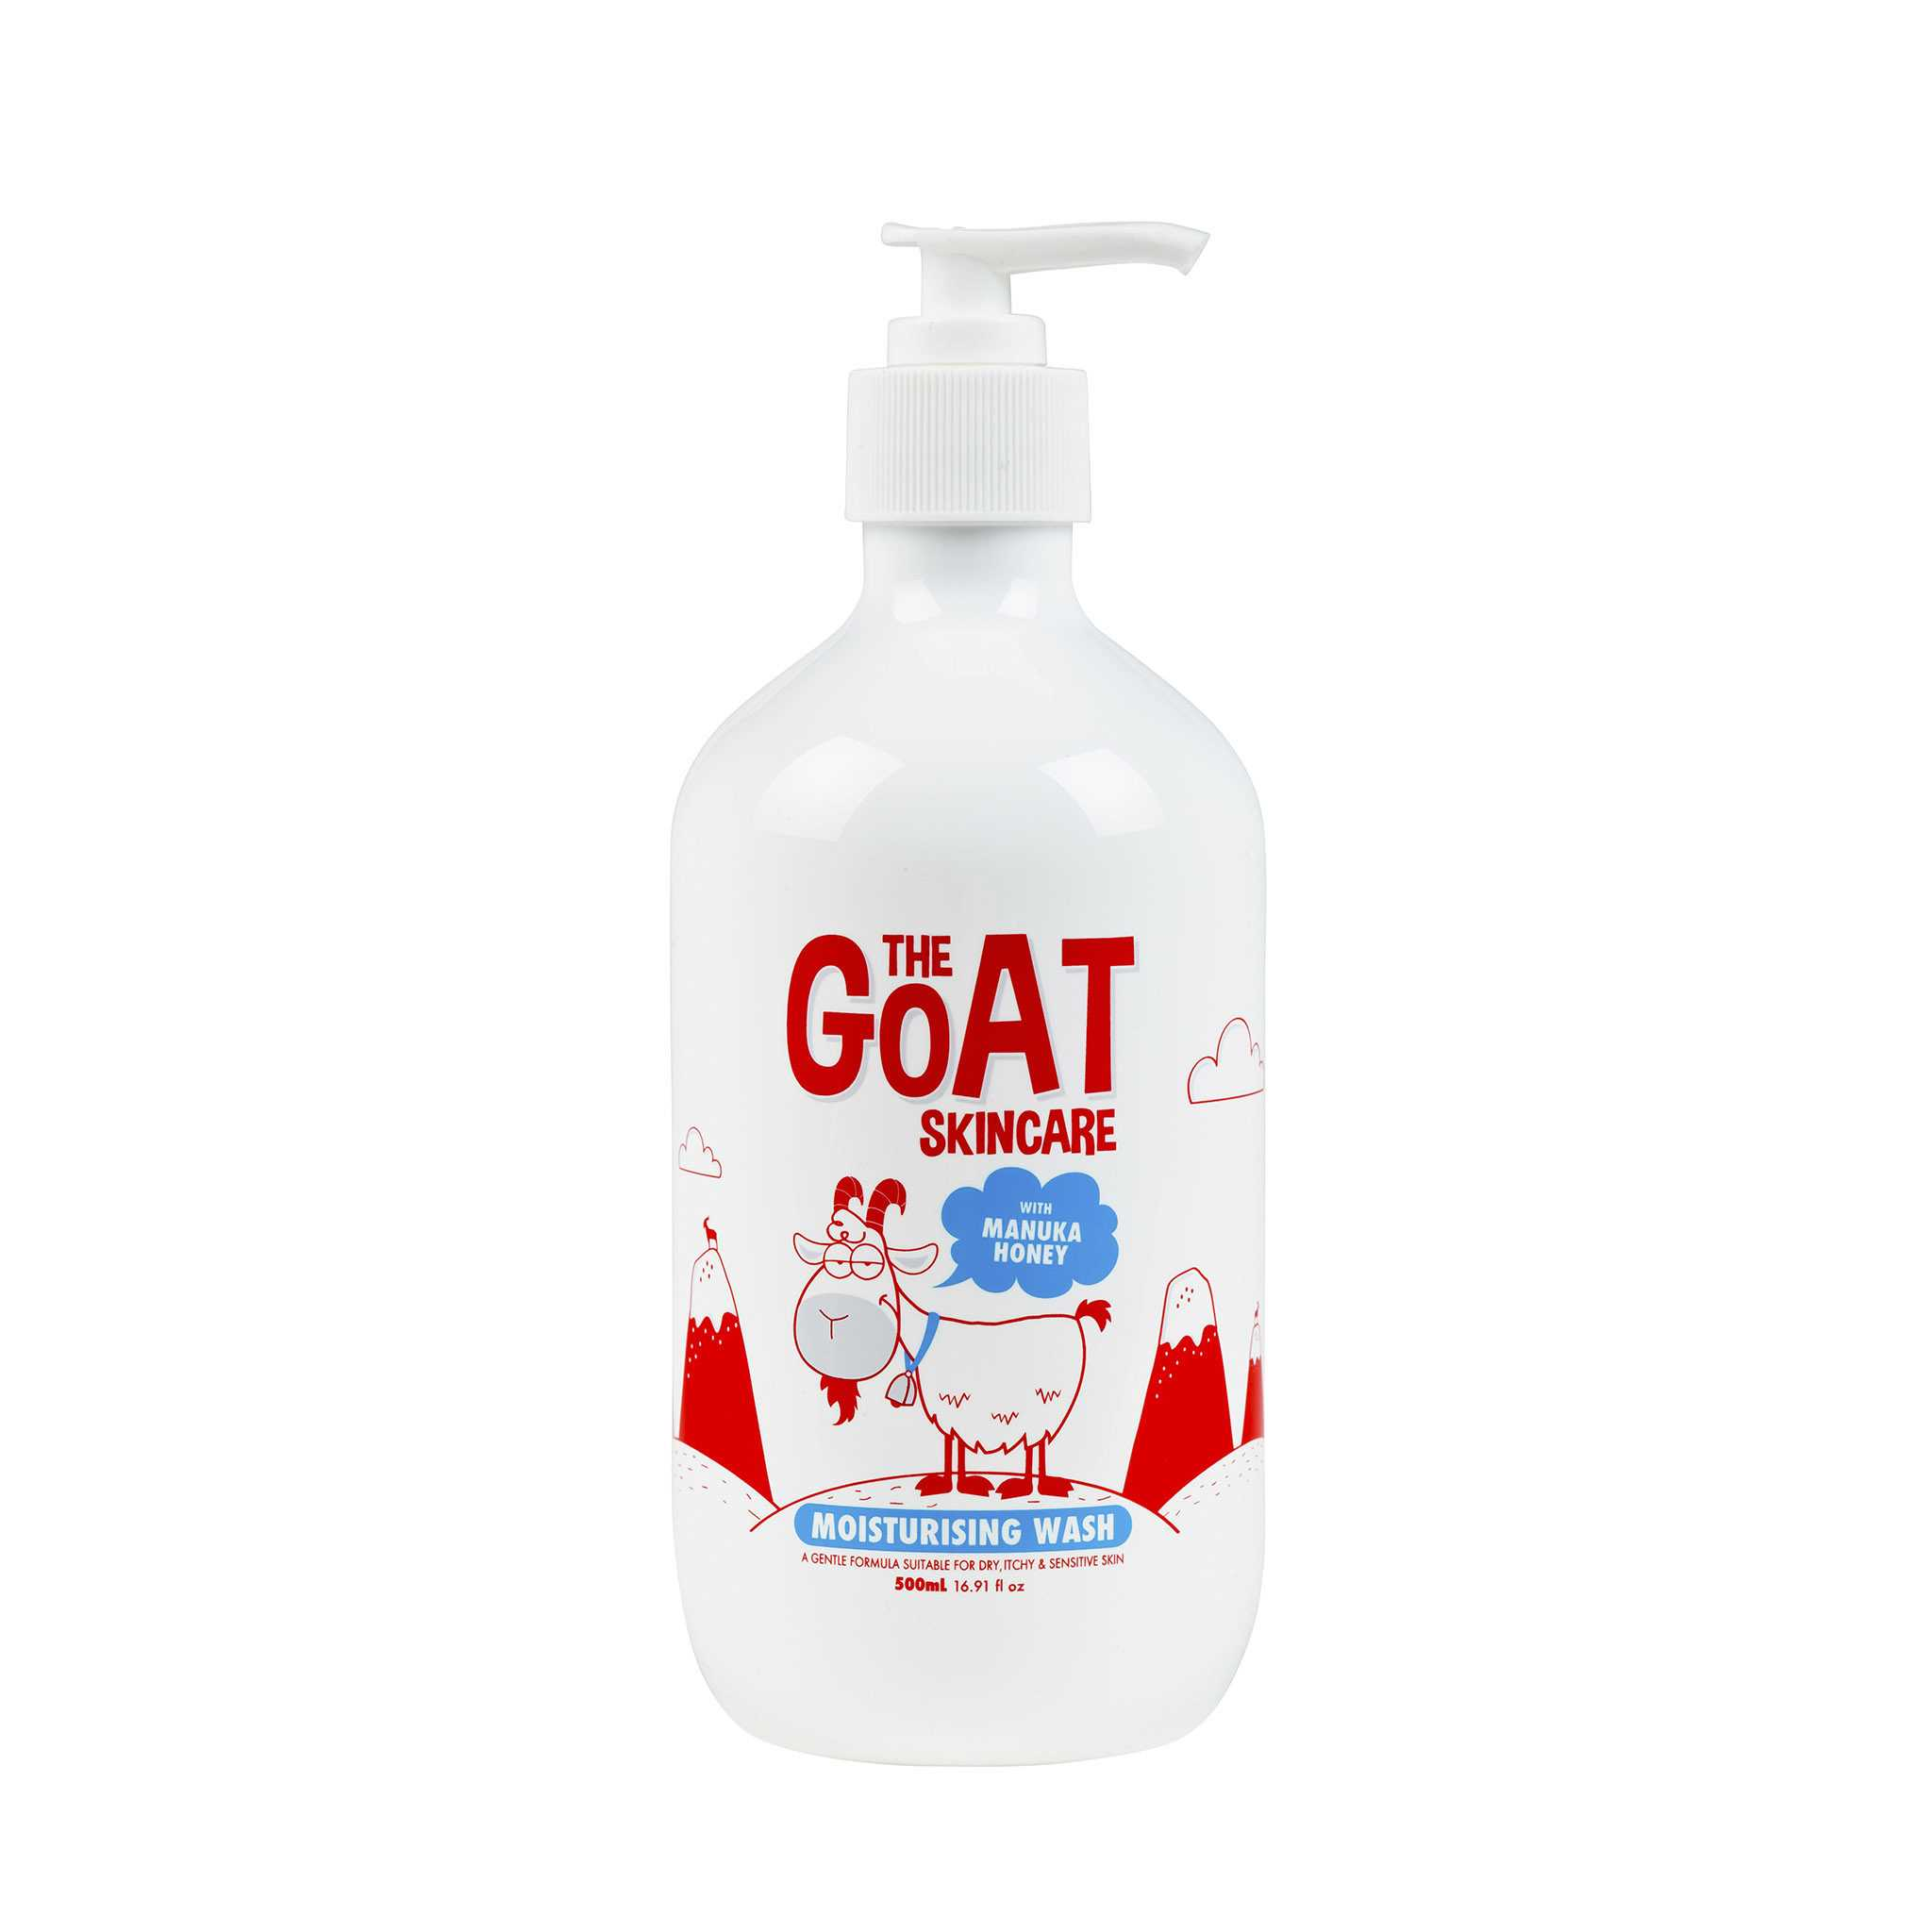 The Goat Skincare 羊奶濕沐浴露 麥盧卡蜂蜜香味 500ml